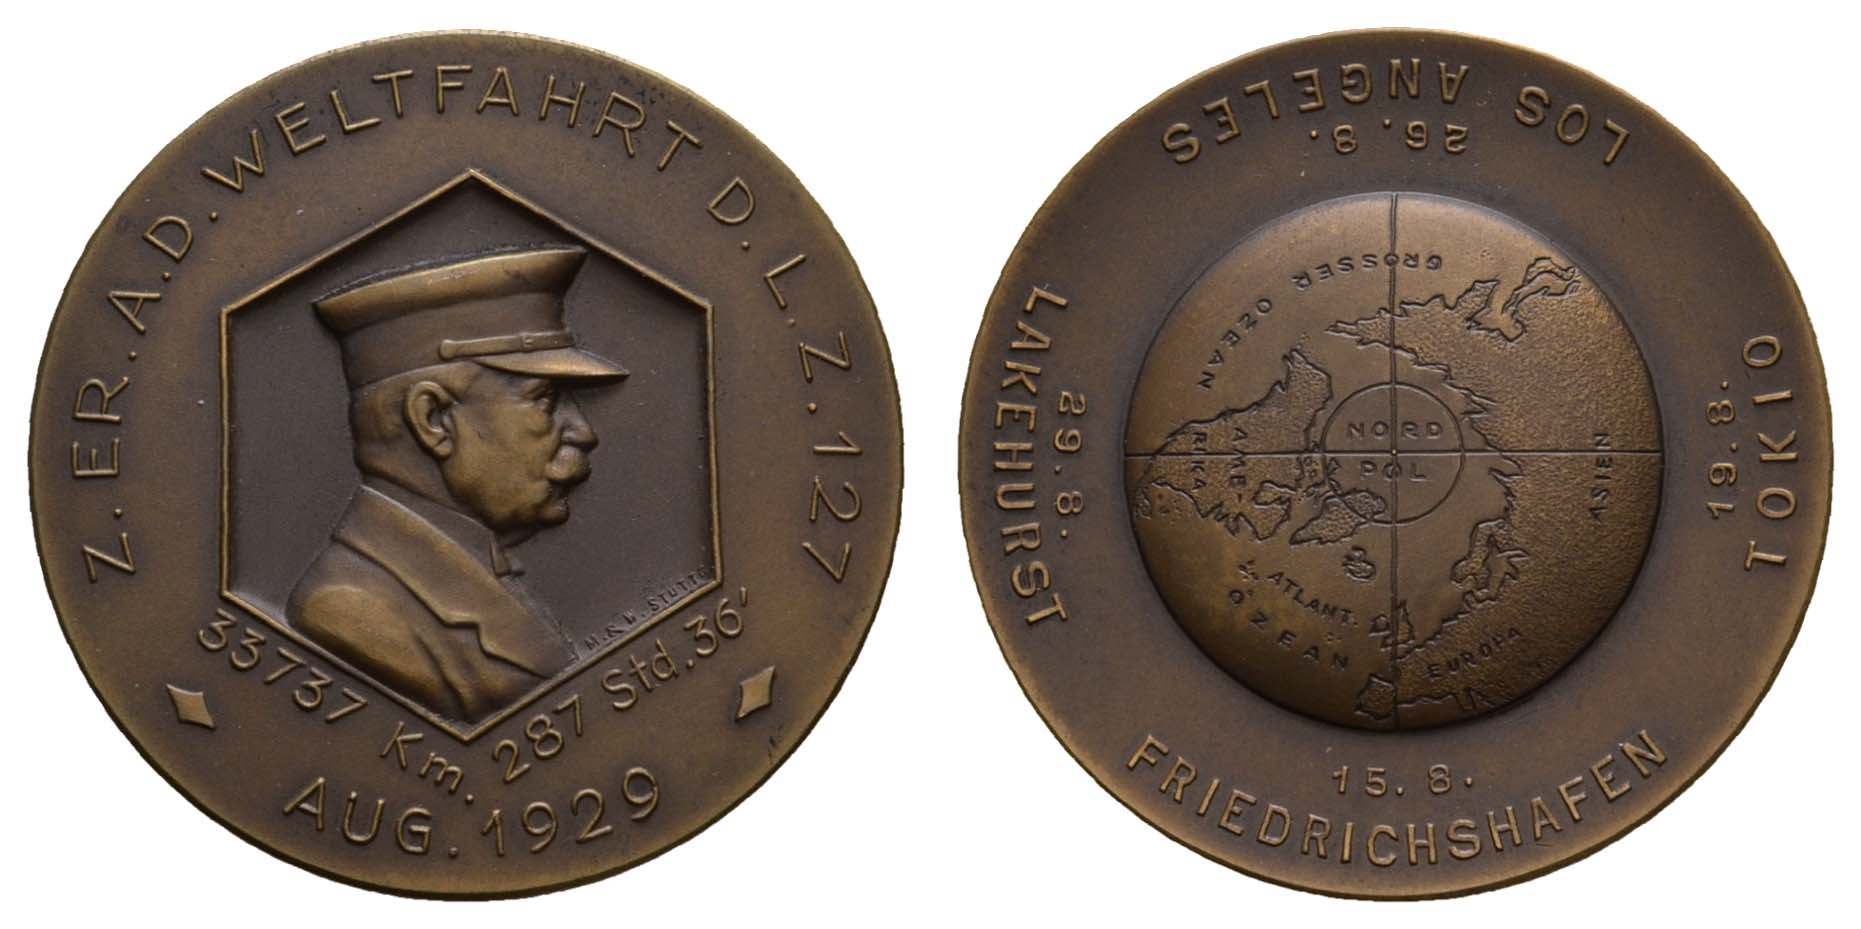 Lot 2343 - medaillen Sonstige Medaillen - Zeppelin -  Auktionshaus Ulrich Felzmann GmbH & Co. KG Coins single lots